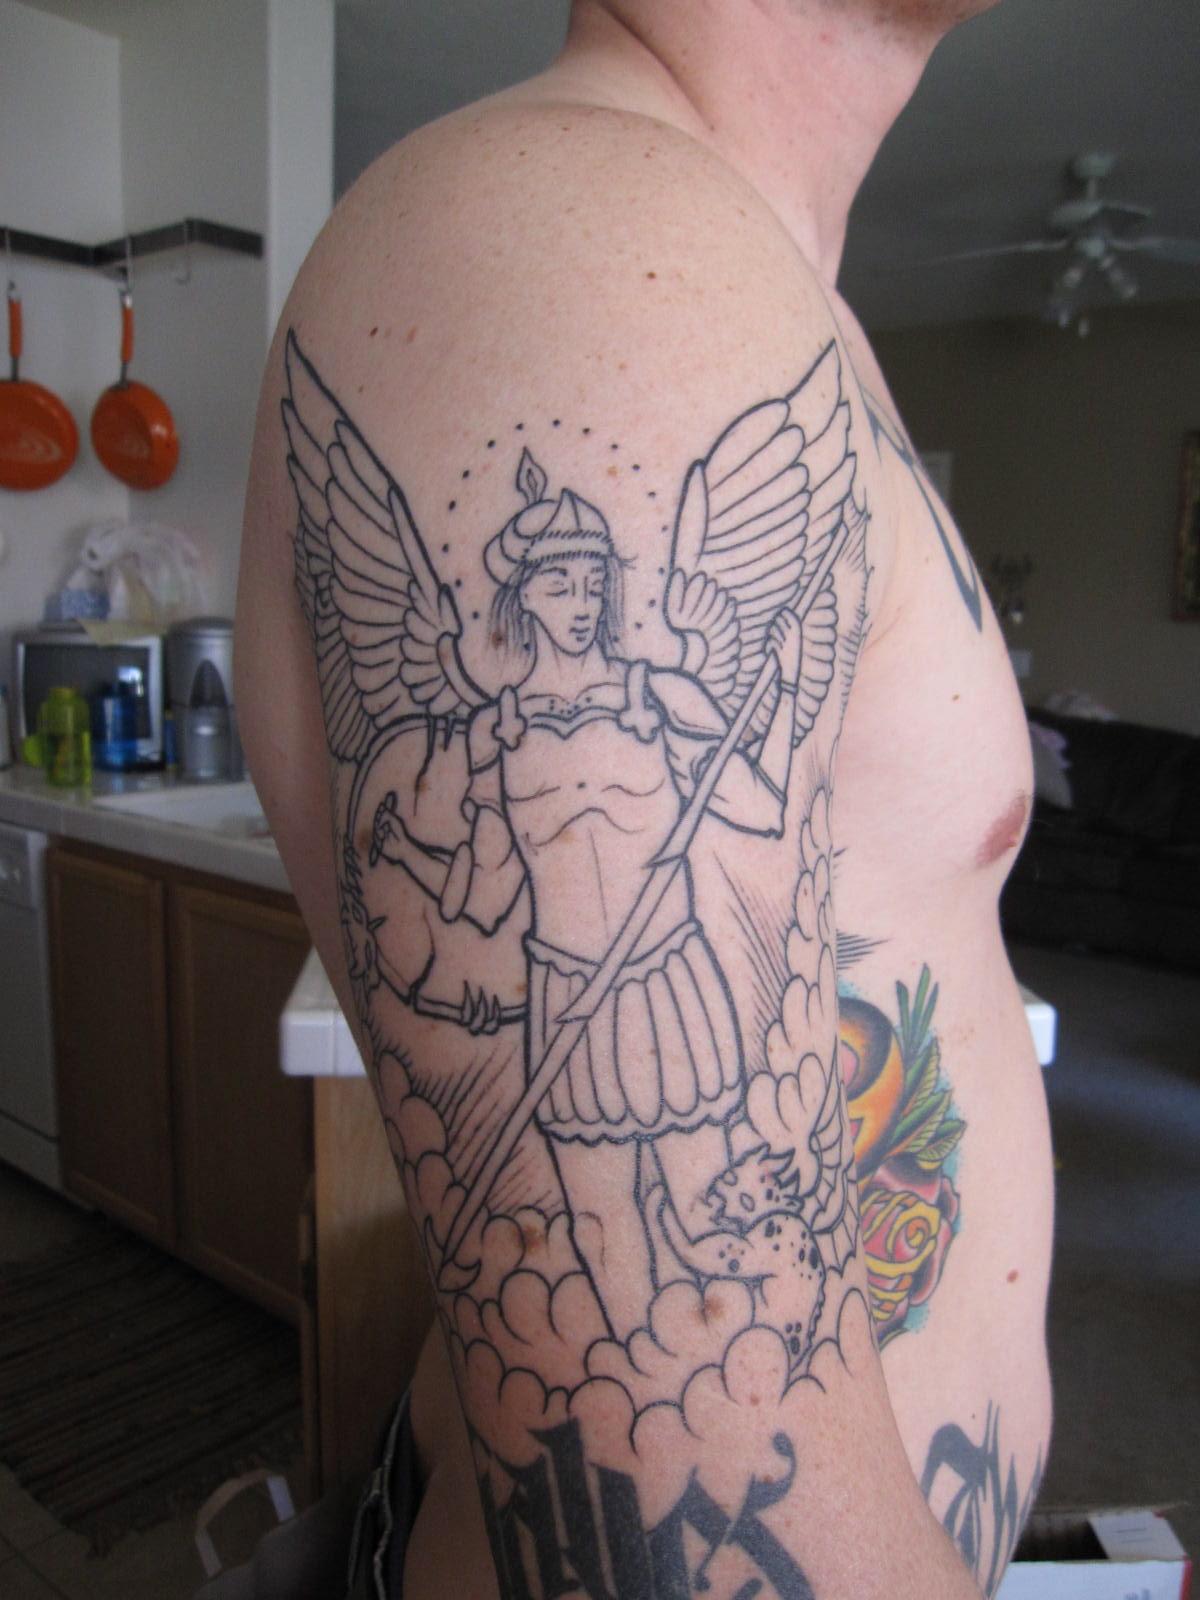 Best Tattoos Ever Seen Eminem Chest Tattoo